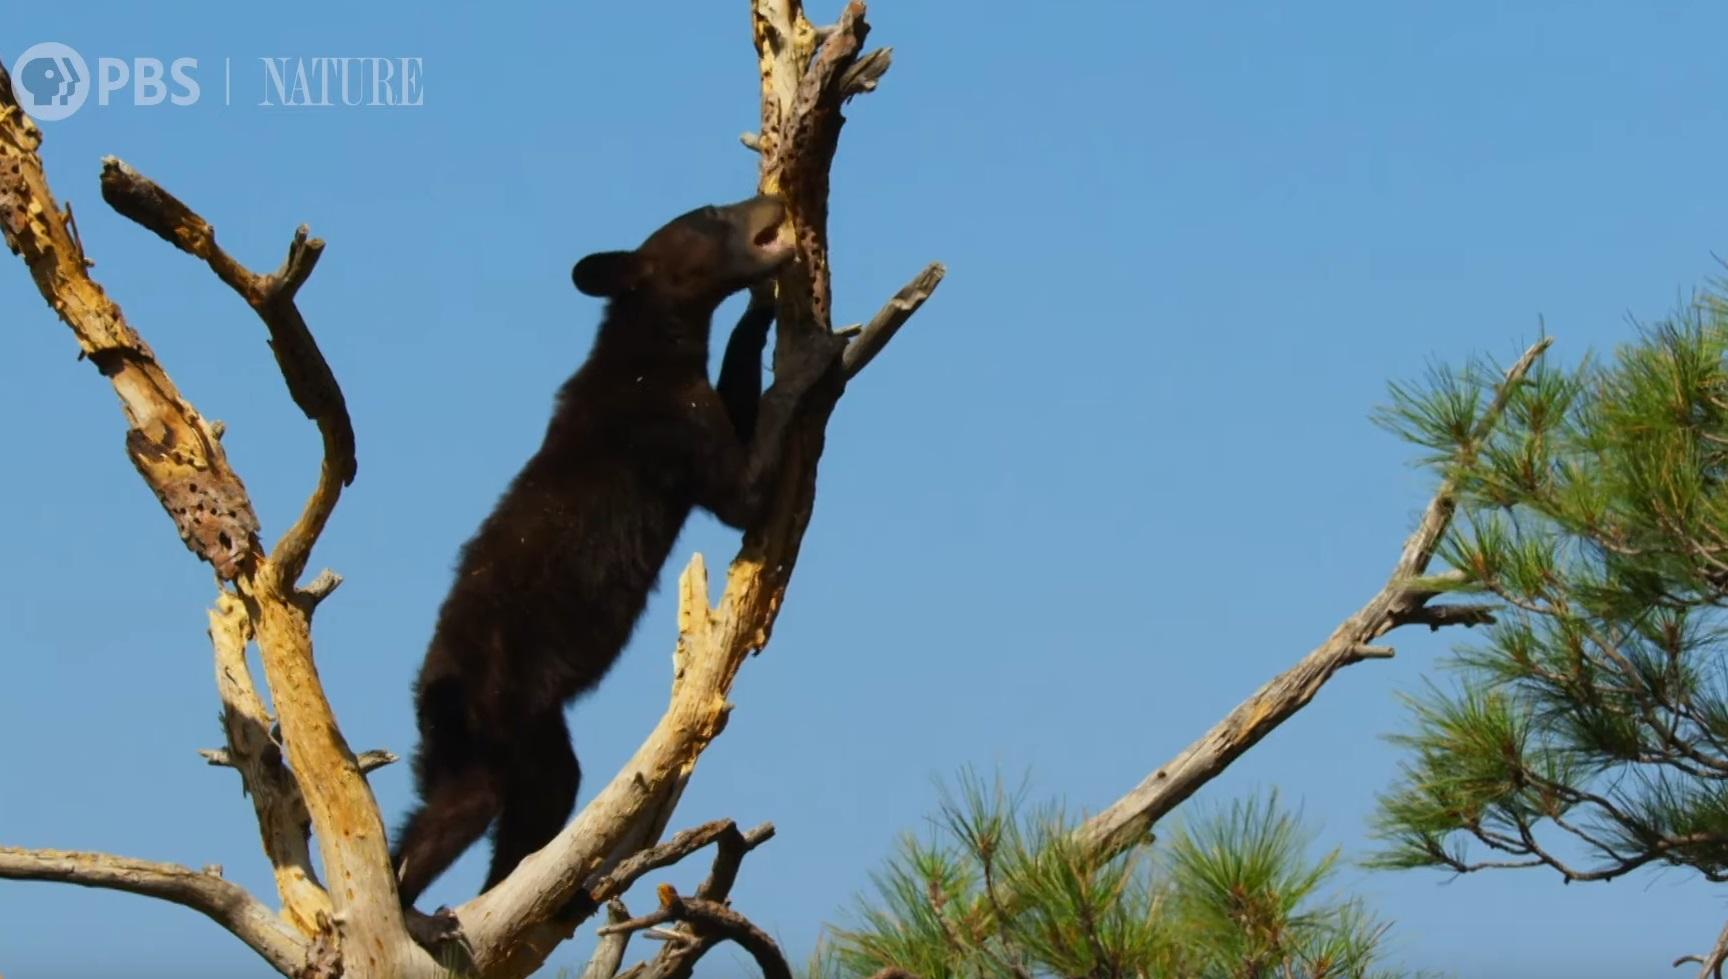 Hungry Bear Steals Acorns